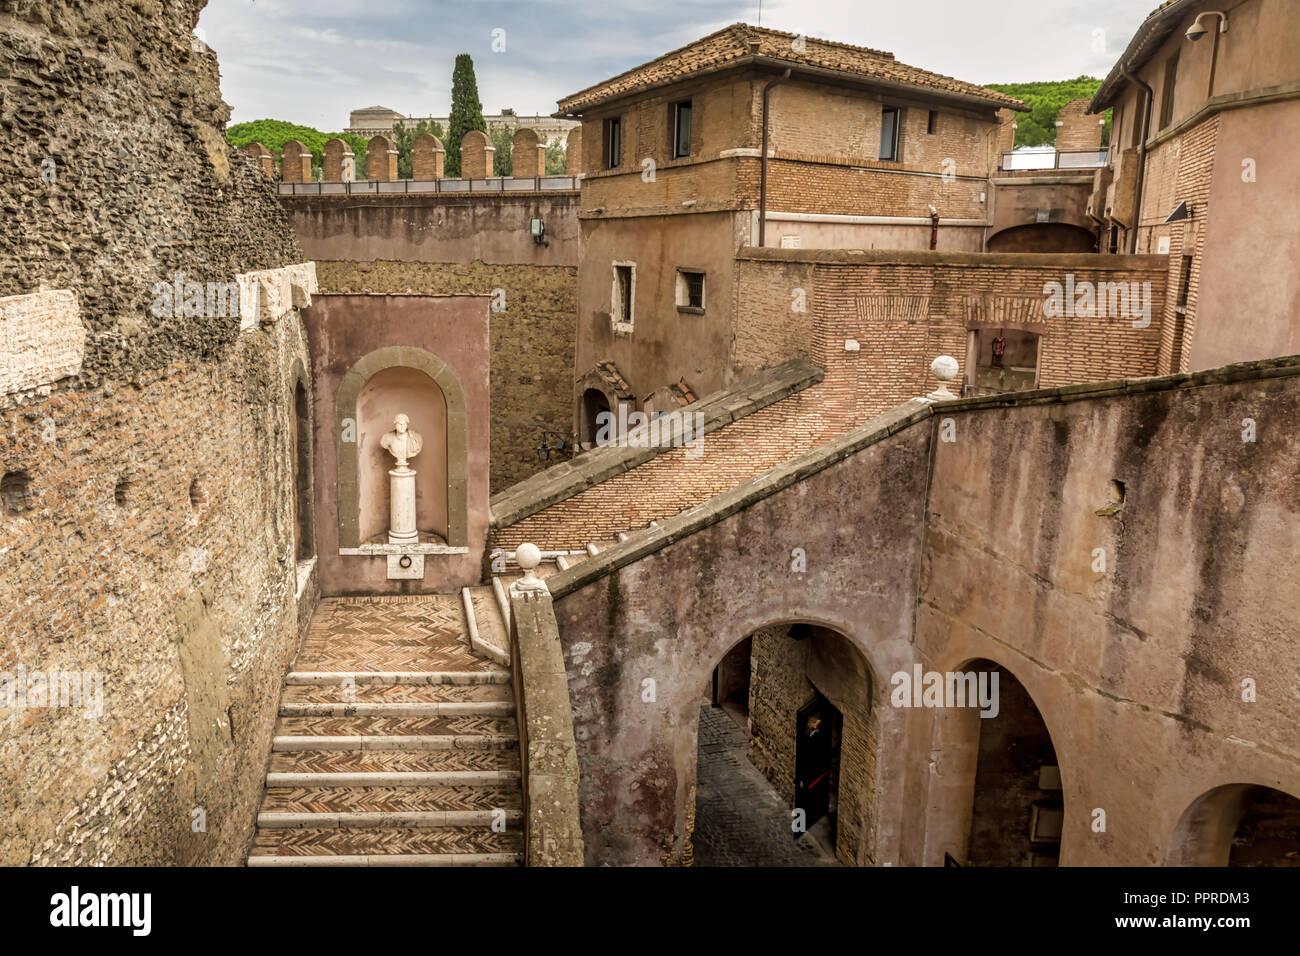 Castel Sant'angelo Interior Stock Photos & Castel Sant